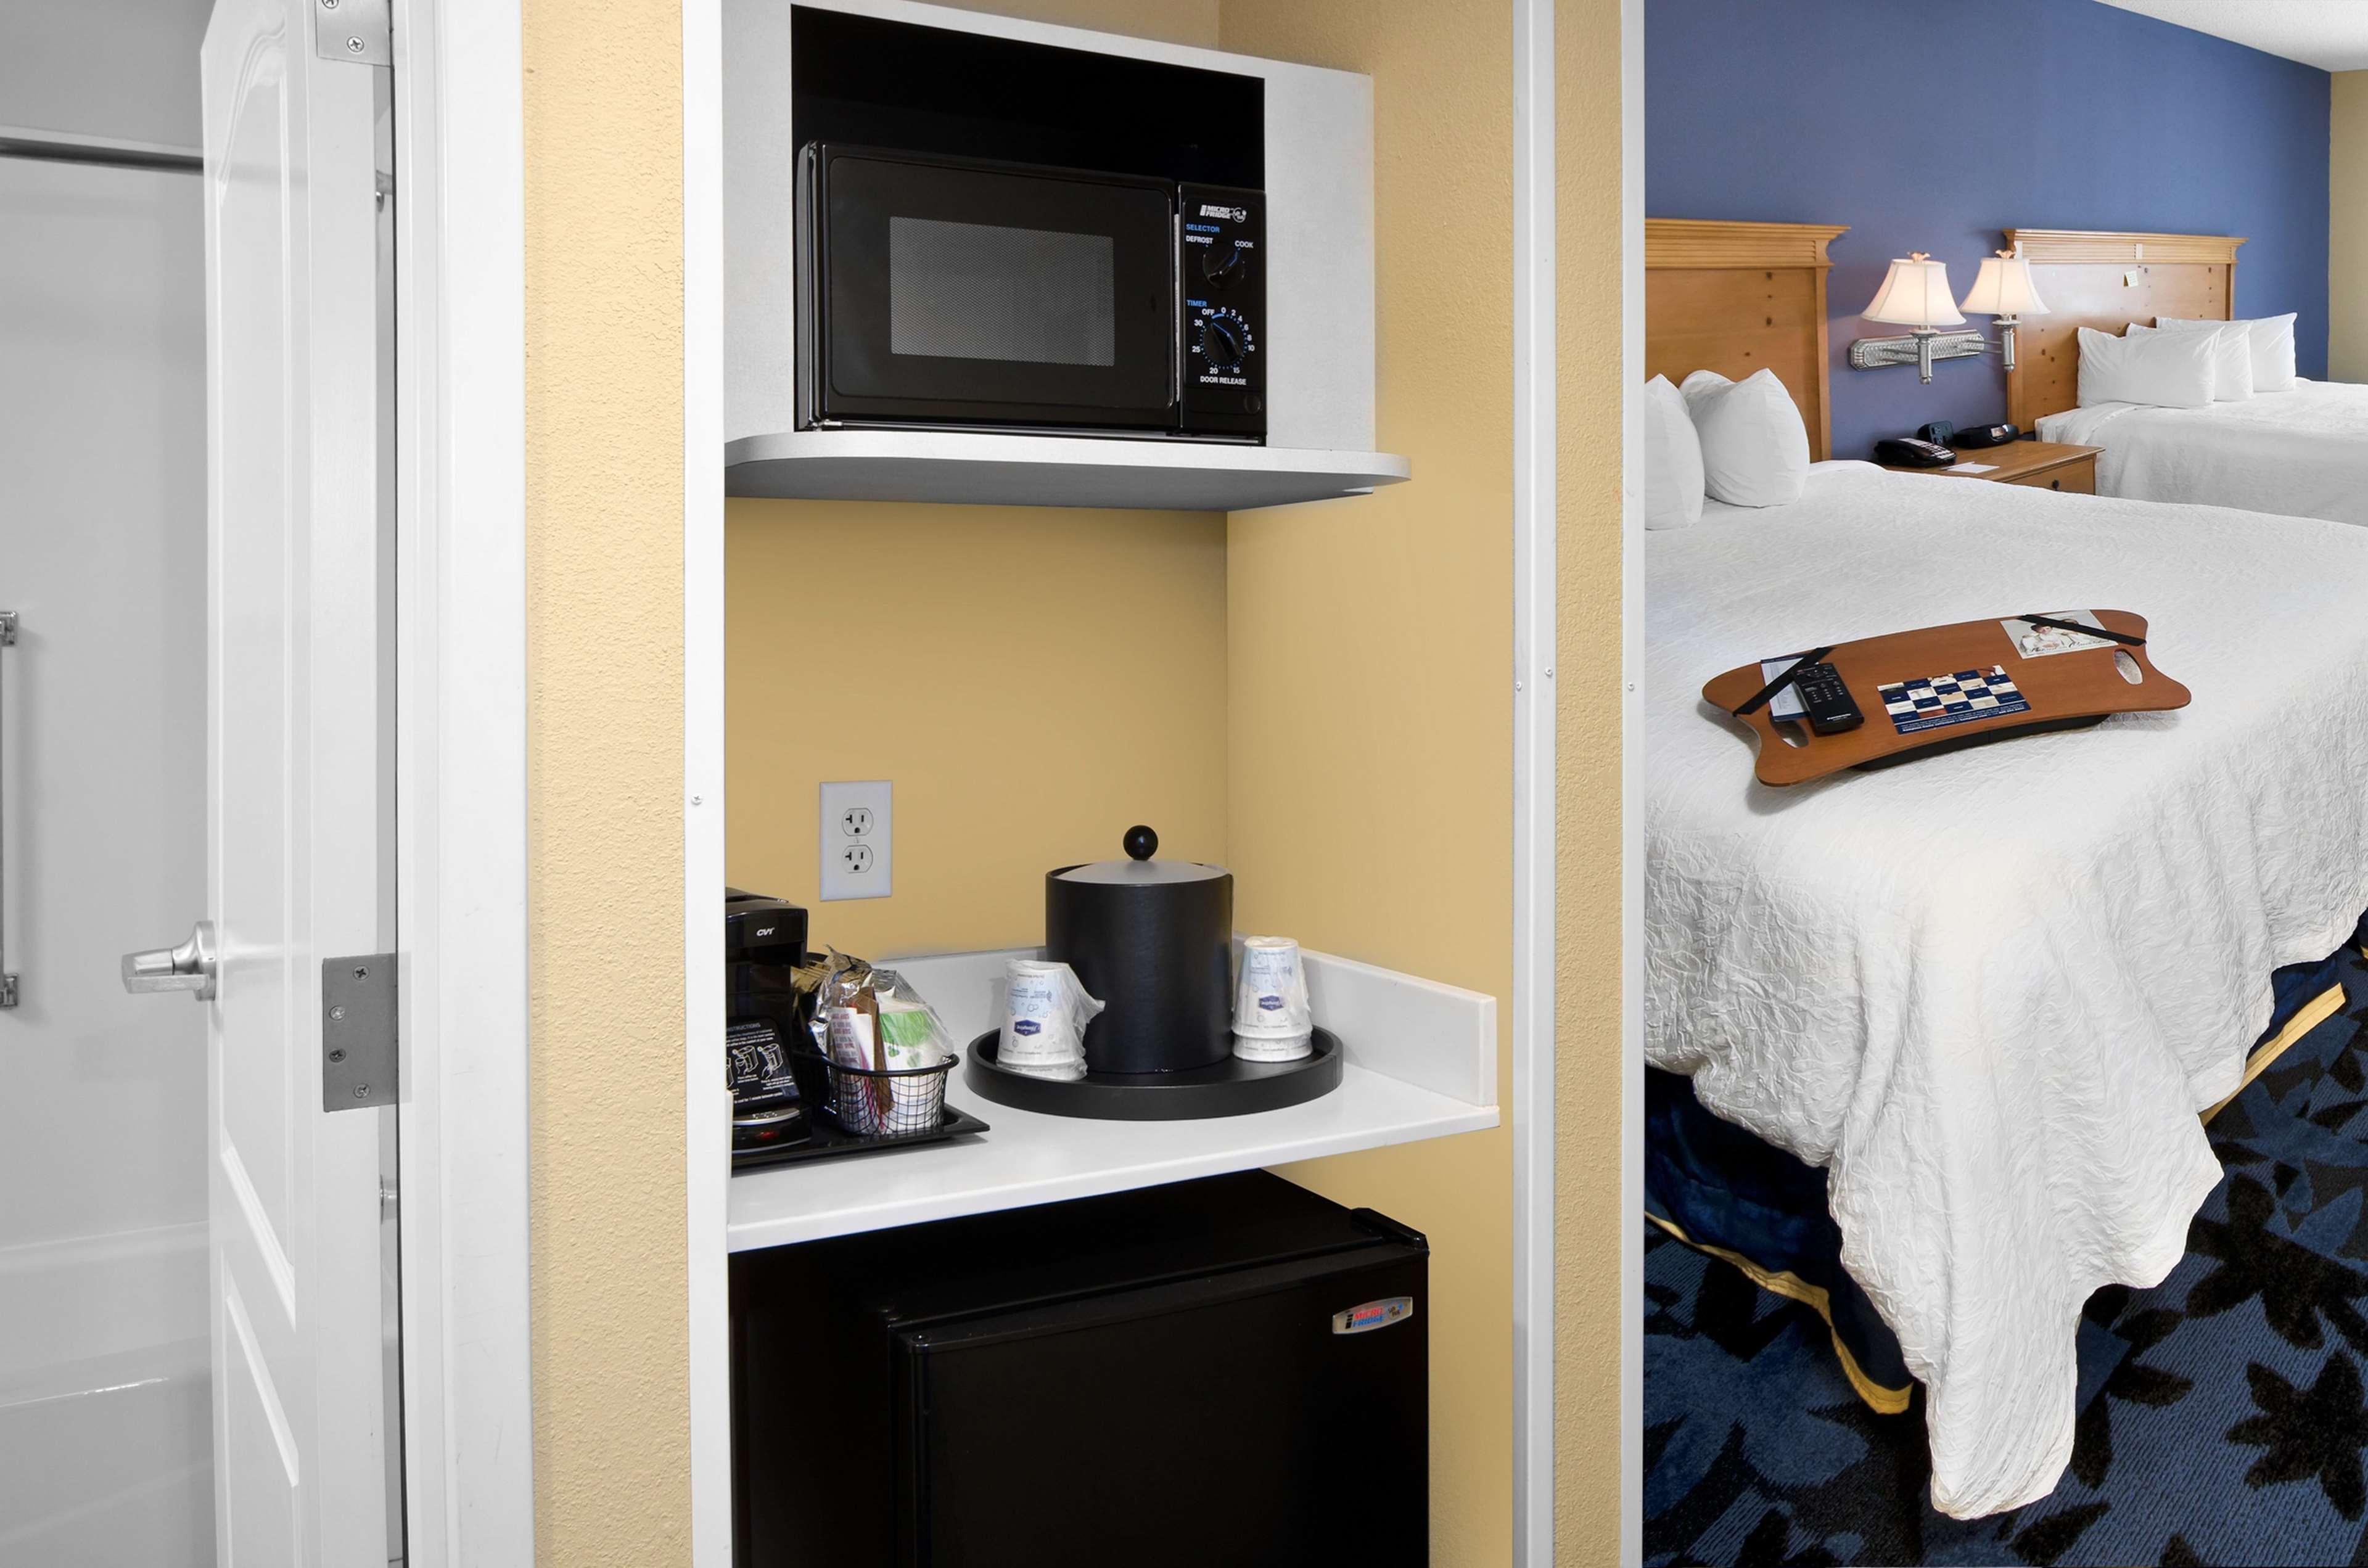 Hampton Inn & Suites Jacksonville South-St. Johns Town Center Area image 37